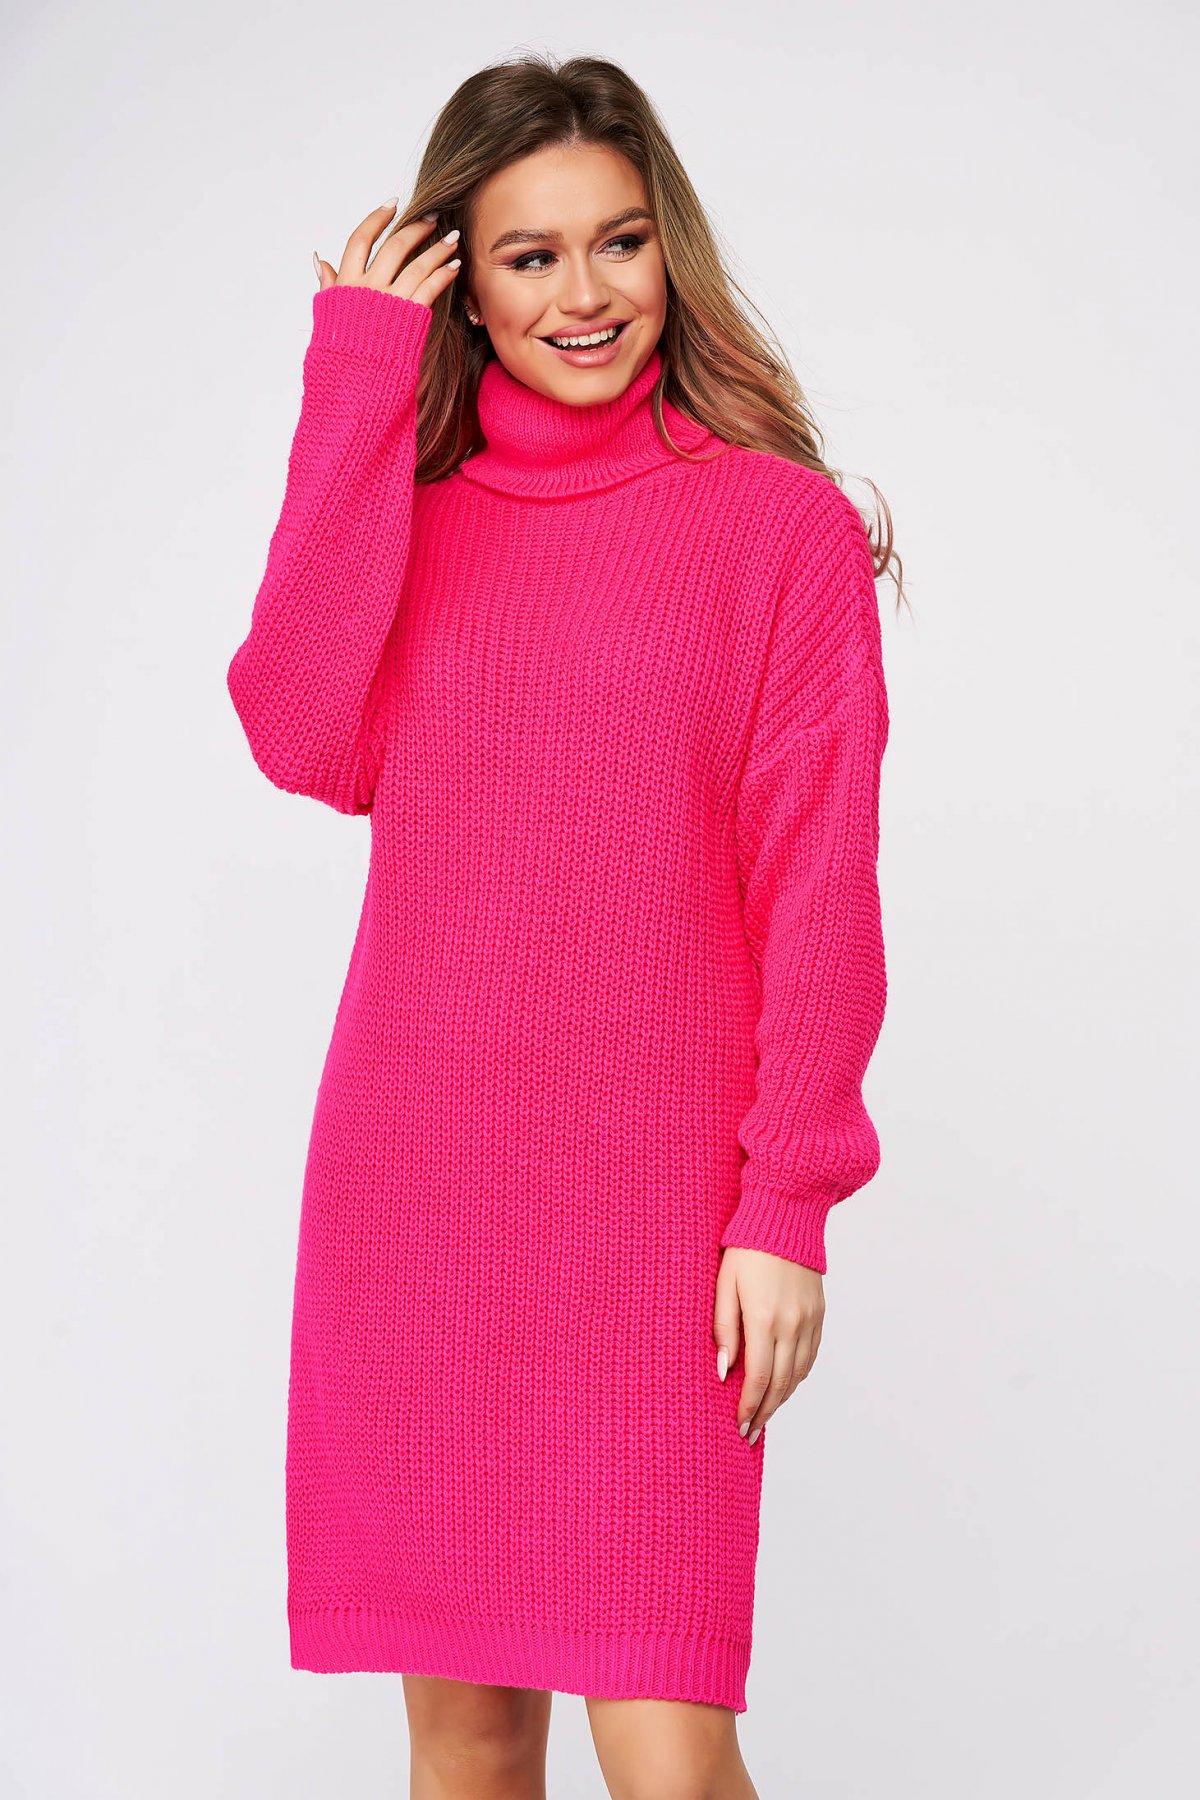 Rochie SunShine casual roz din material tricotat pe gat cu croi larg SunShine